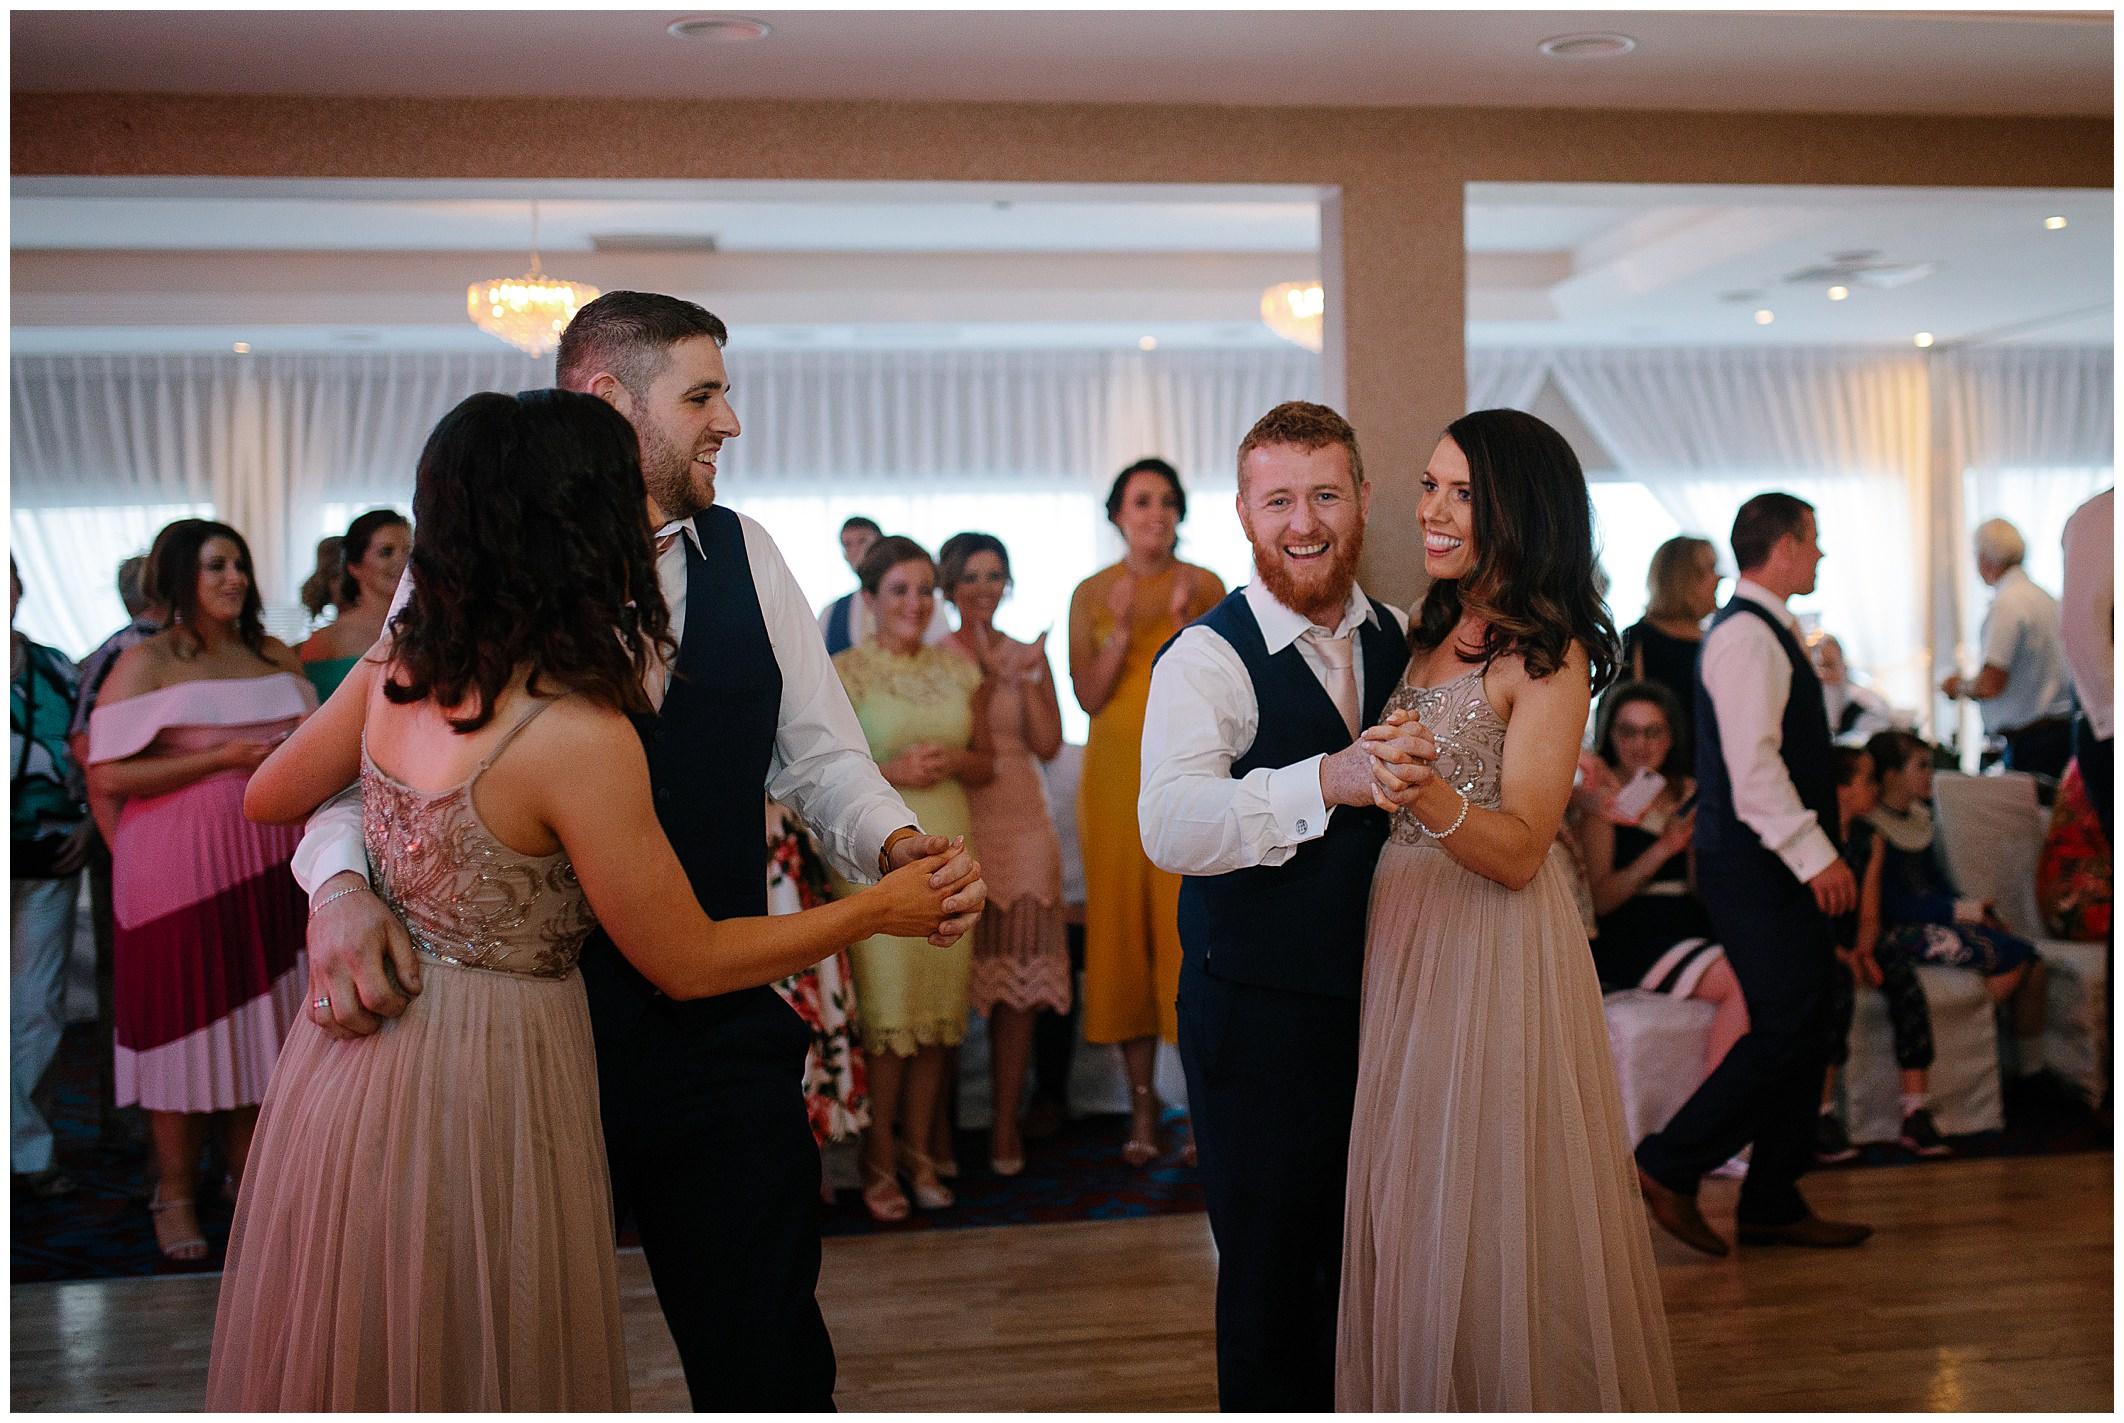 redcastle-hotel-wedding-karen-brian-jude-browne-photography-141.jpg